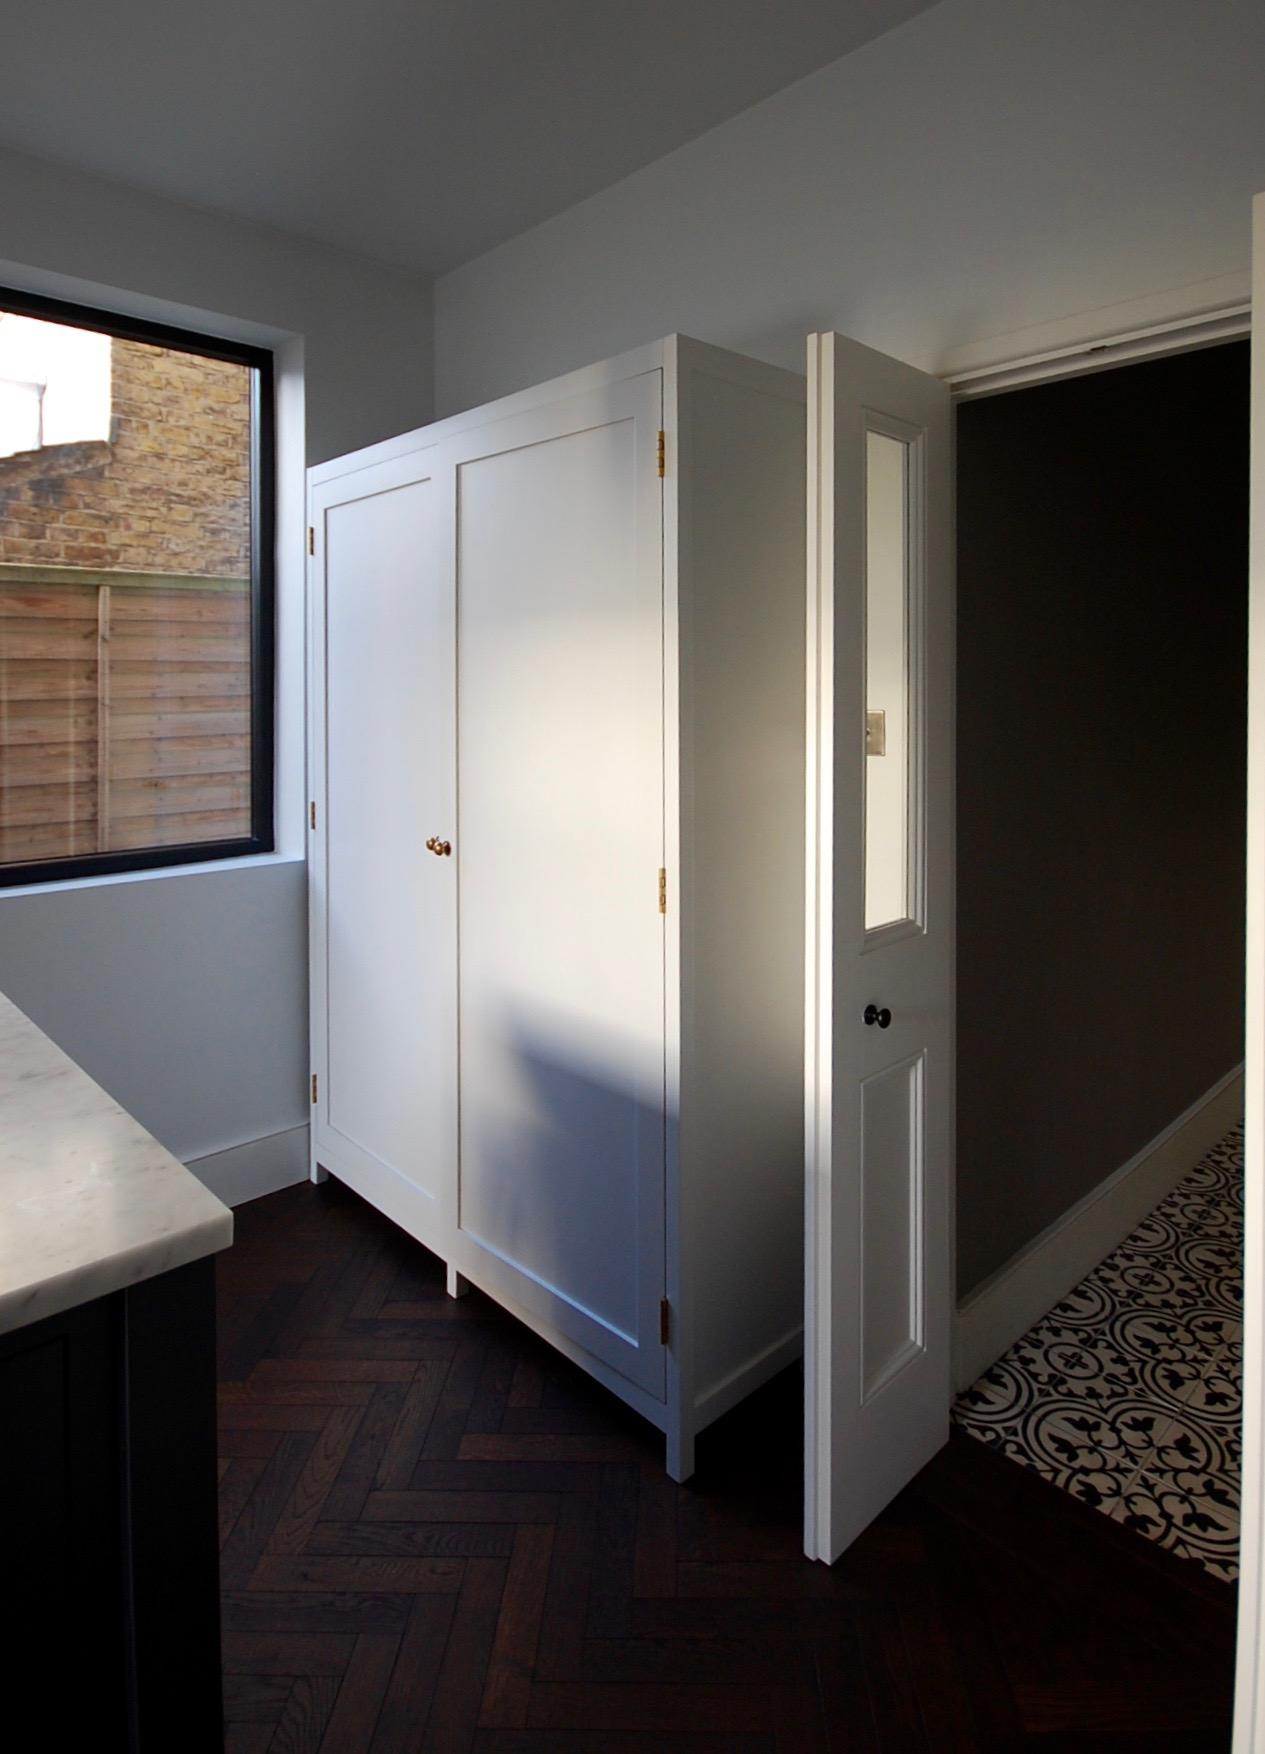 Grain_Bespoke_Furniture_Kitchen Larder_3.jpg